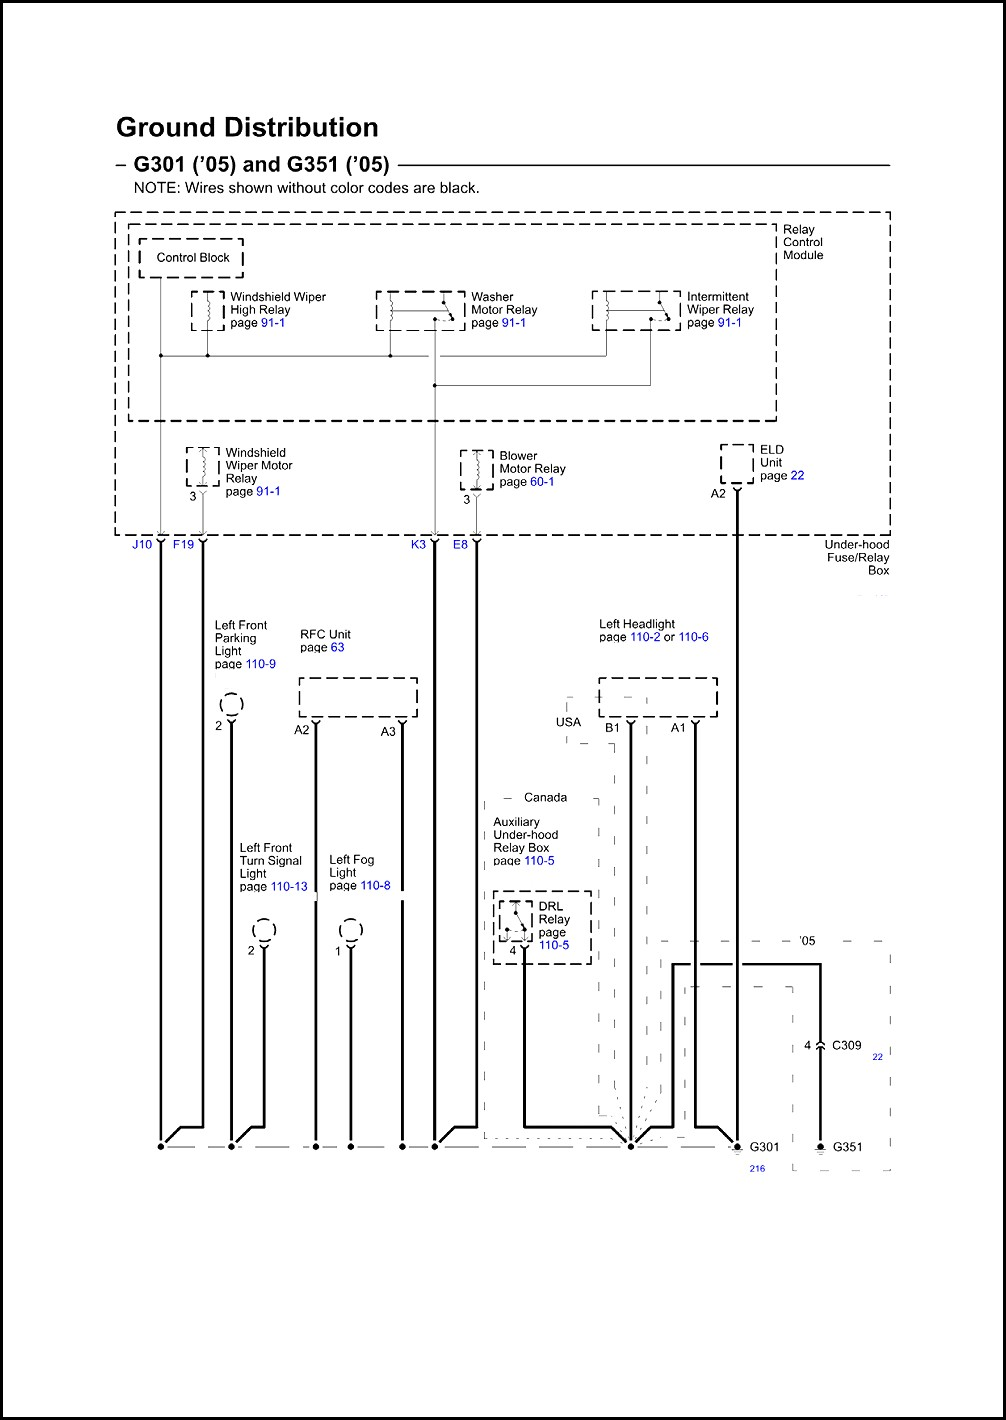 hight resolution of 110 block rj45 wiring diagram wiring diagram u2022 rh 144 202 50 143